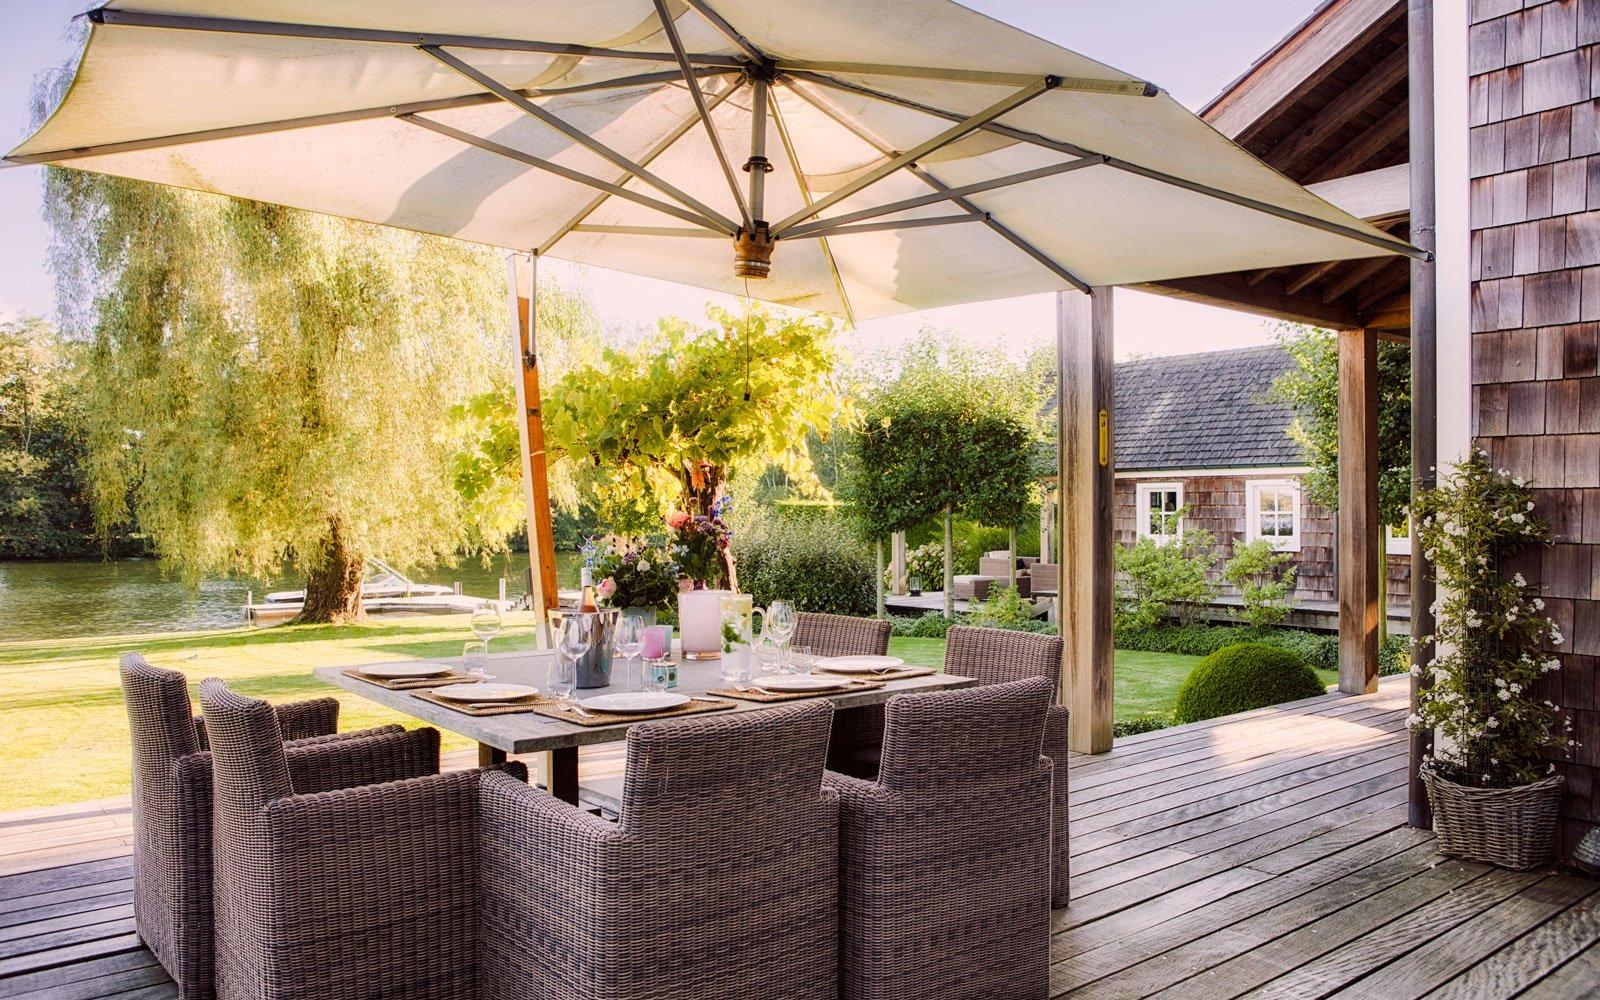 Terras, tuin, tuinmeubelen, parasol, buitenleven, vlonder, Amerikaanse stijl